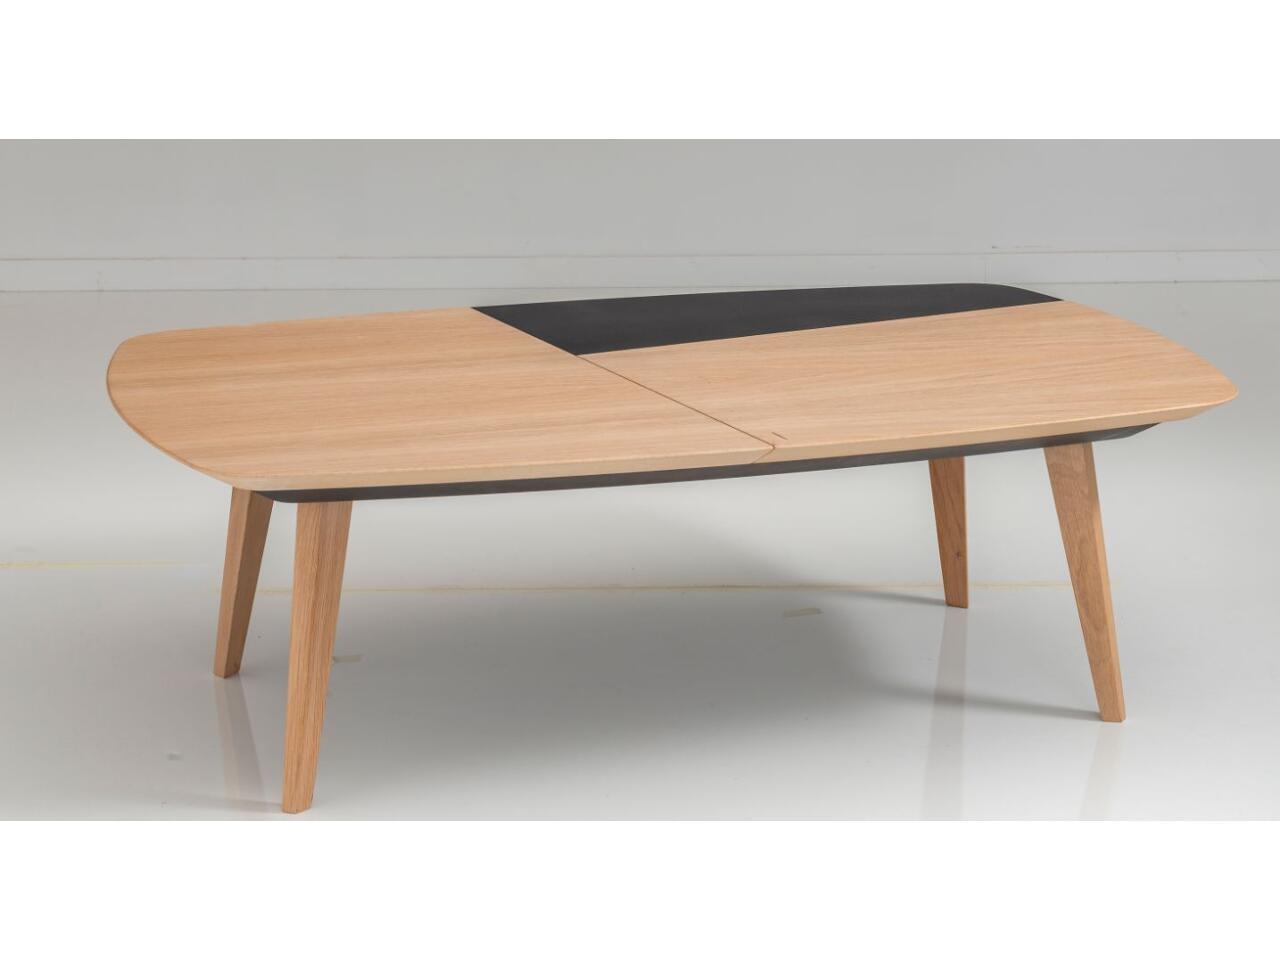 Table Basse Plateau Relevable A Jarcieu